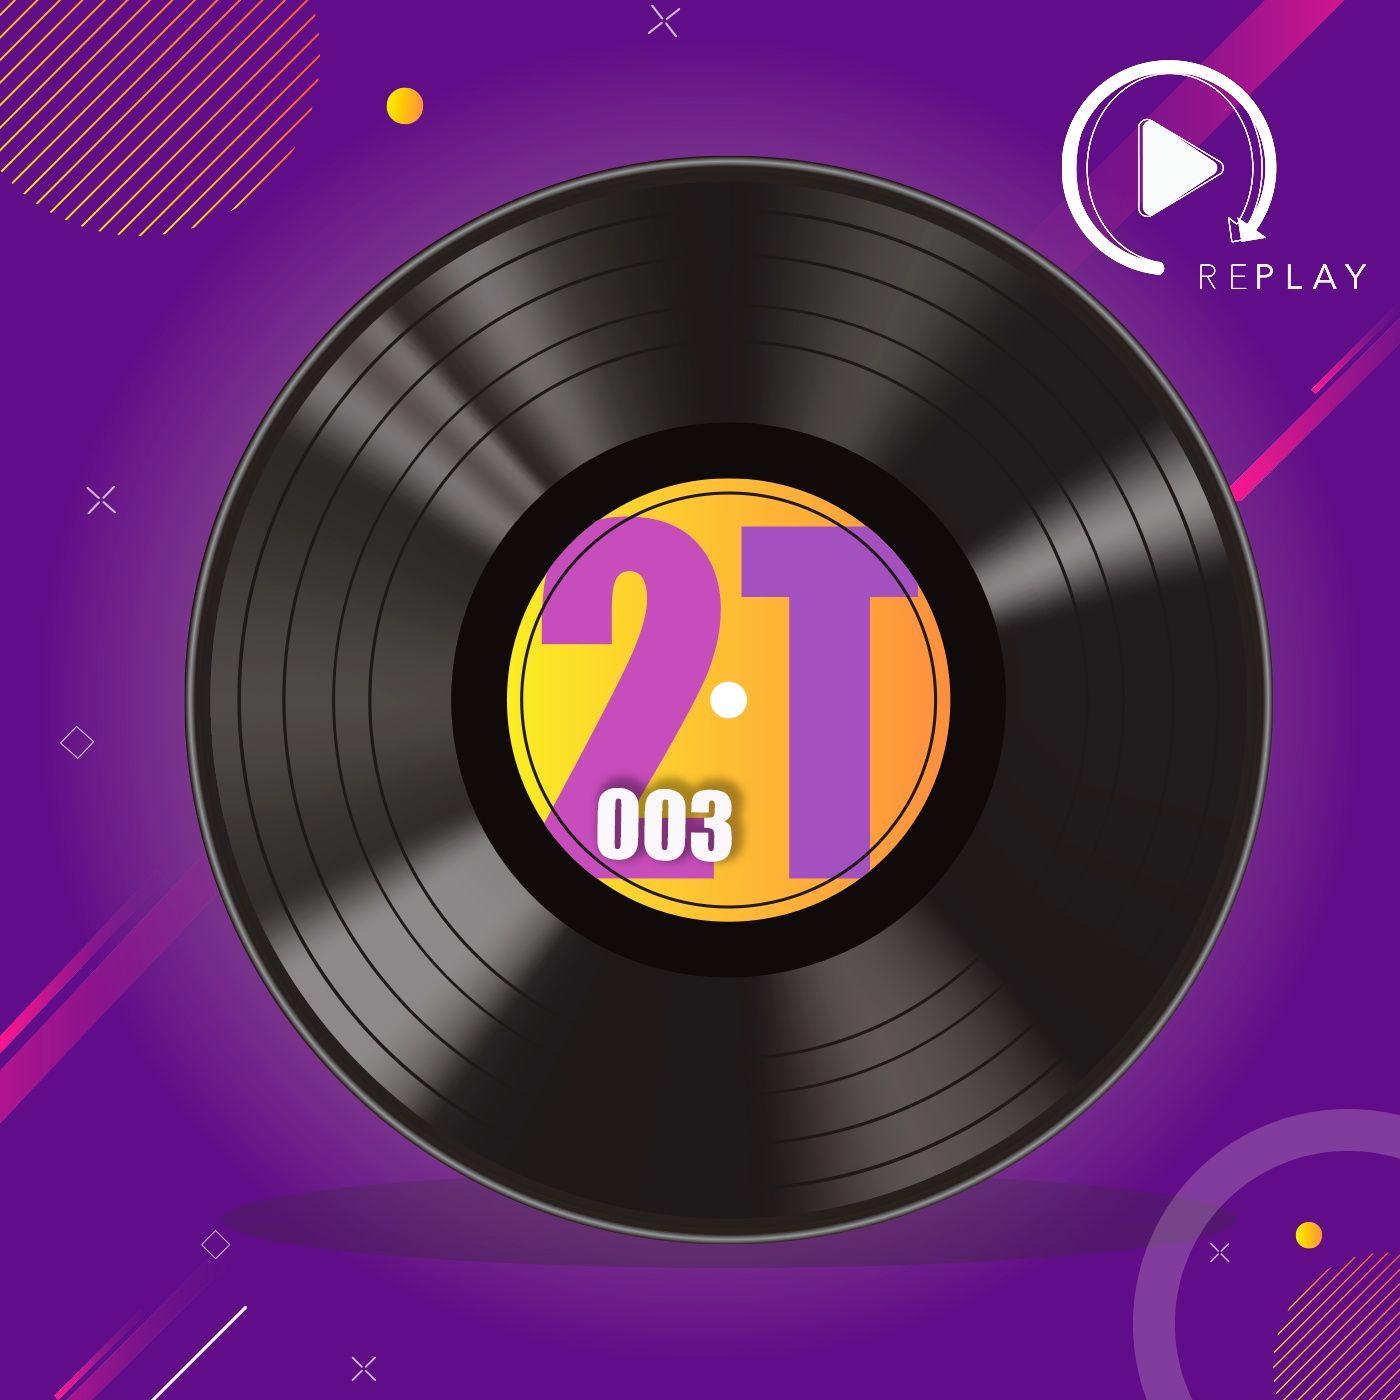 T2-003. La música no conoce de límites (Arlo Parks, Balthazar, Steven Wilson, Griff, Cheap Trick)